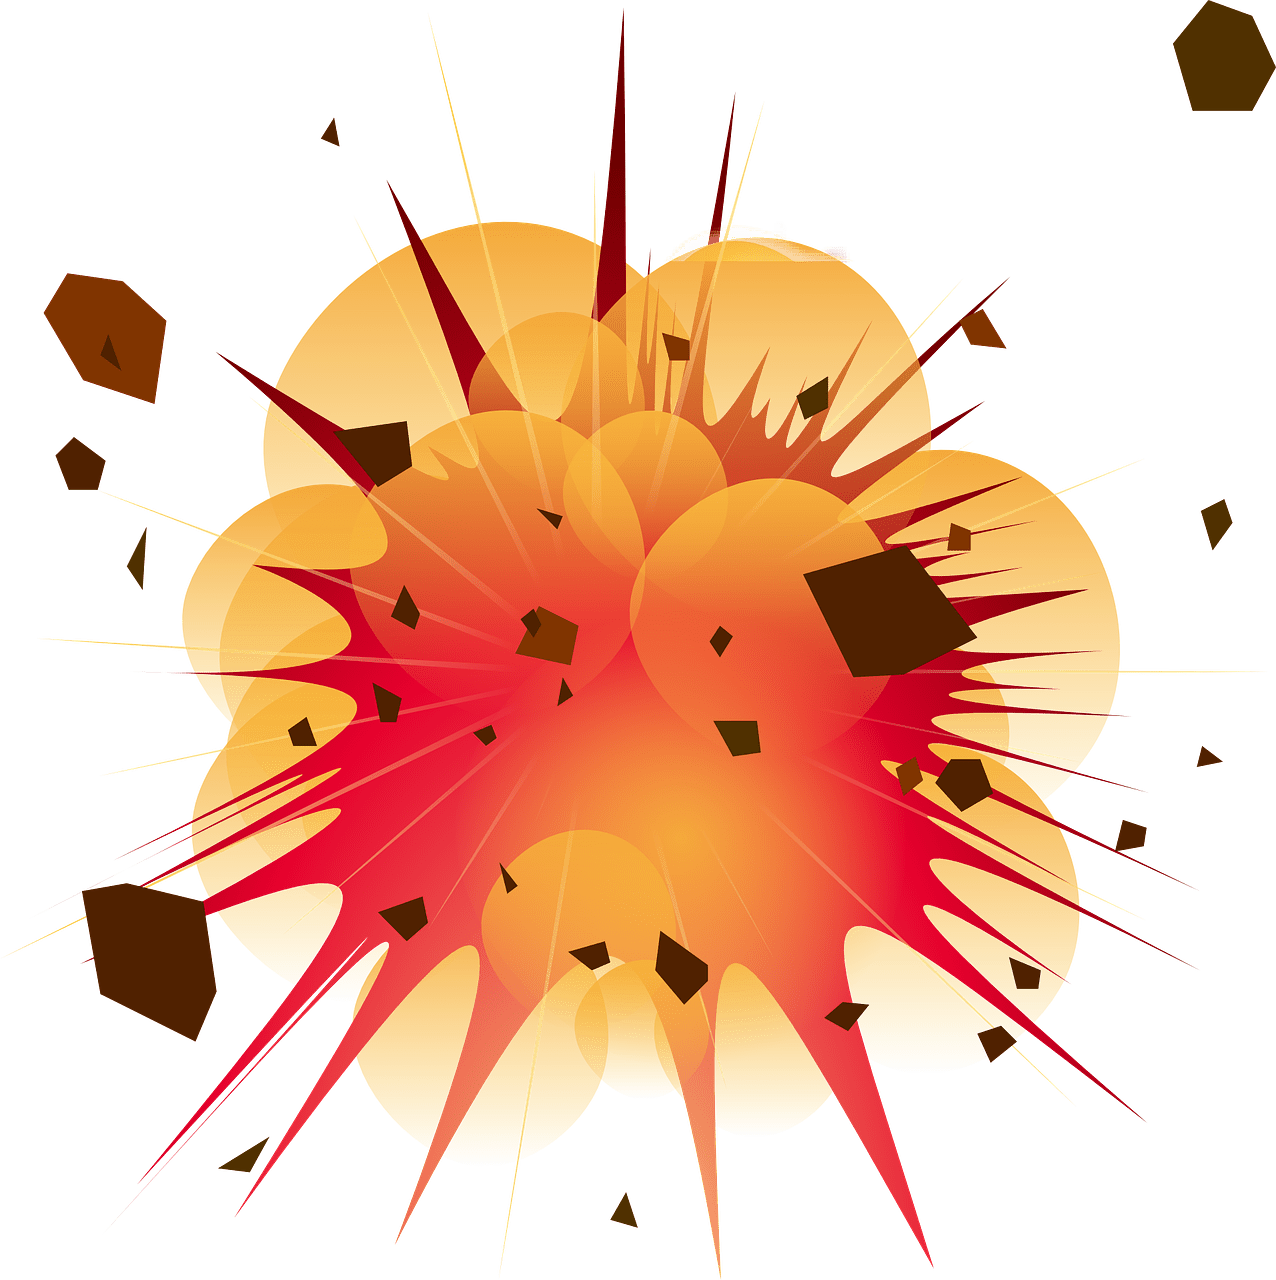 explosion-417894_1280